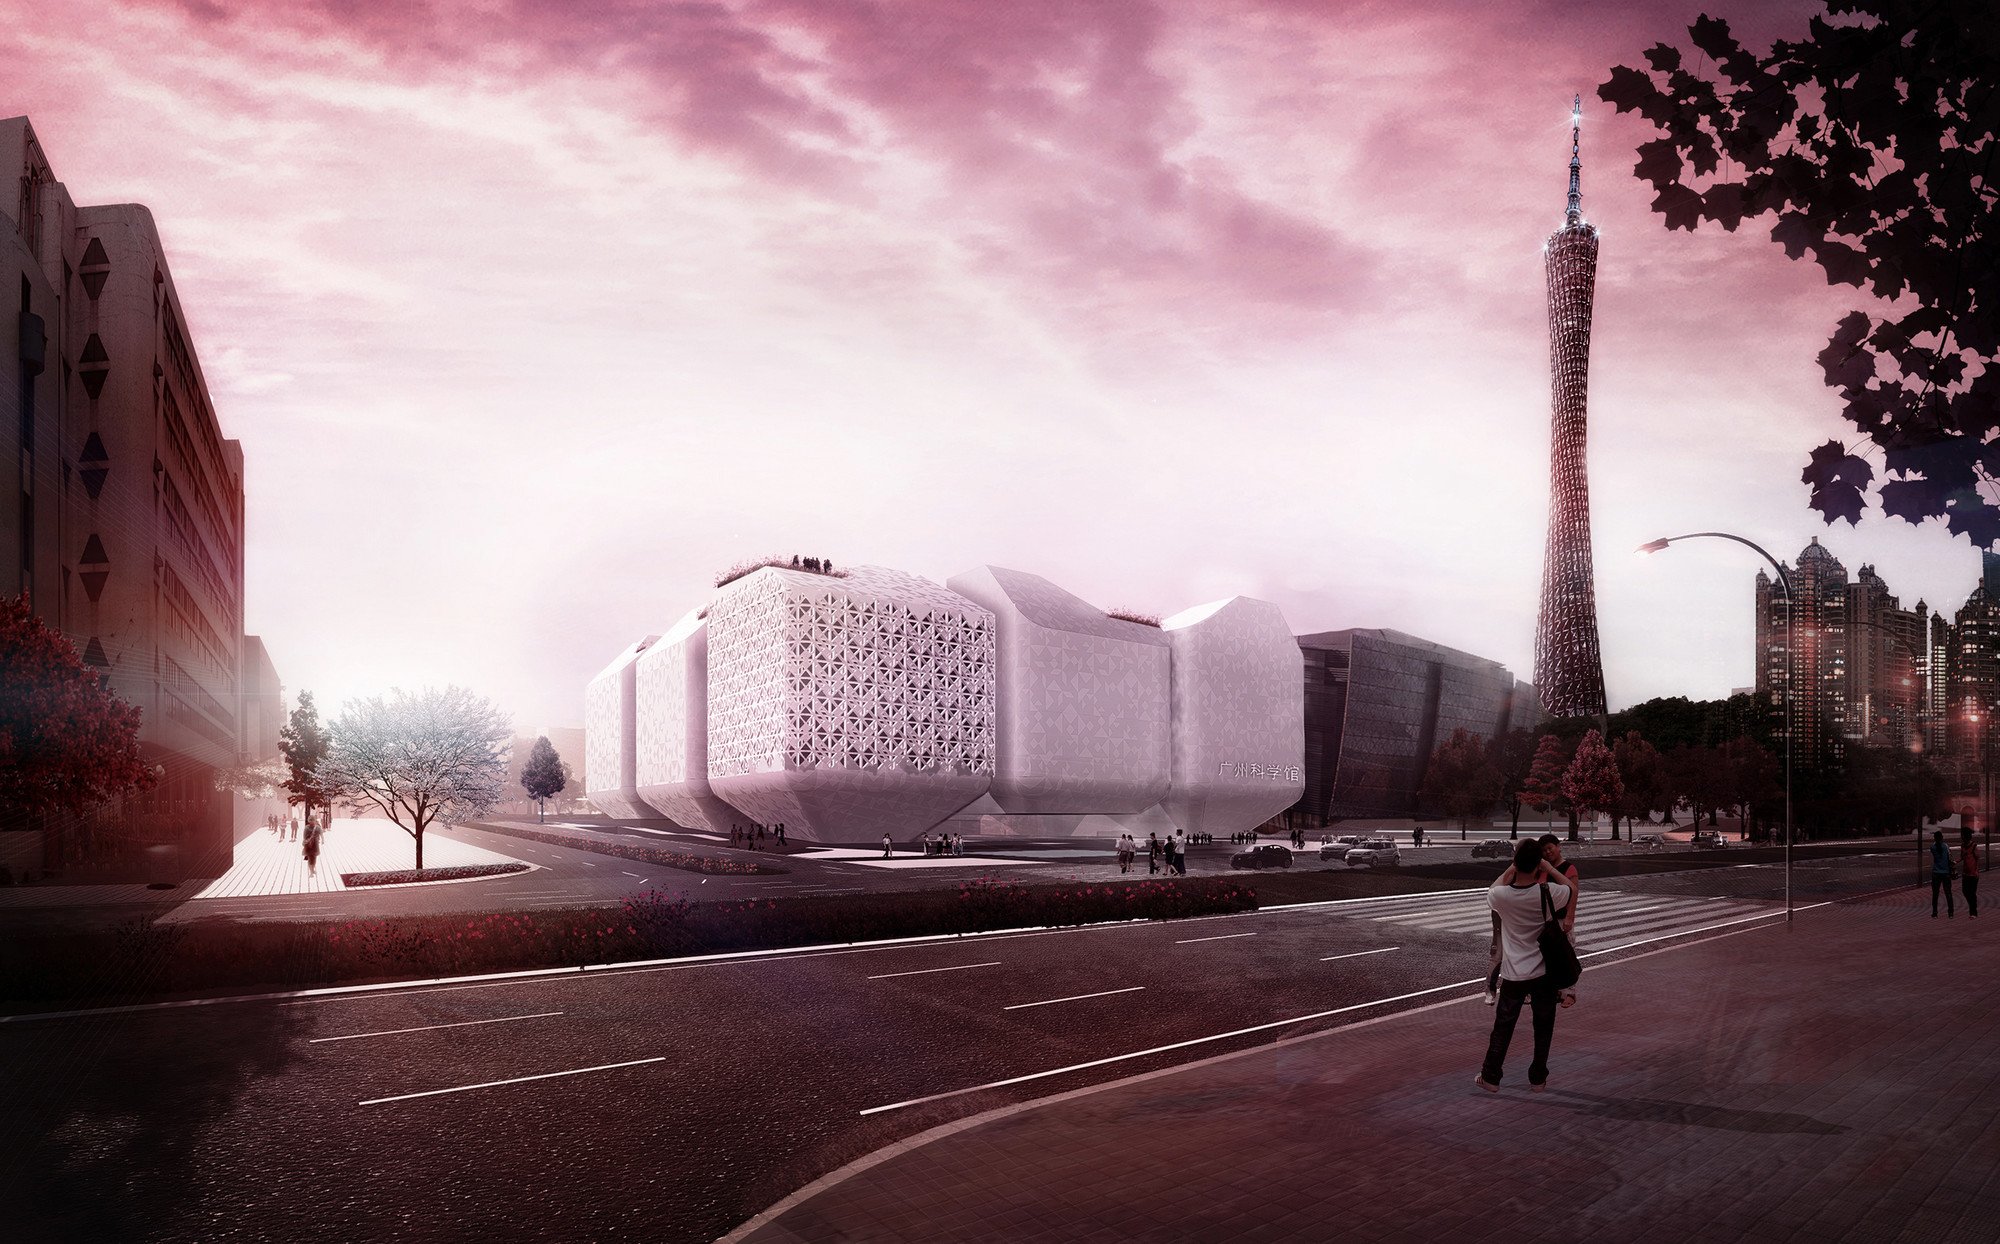 Nieto Sobejano Wins Competition to Design New Guangzhou Science Museum